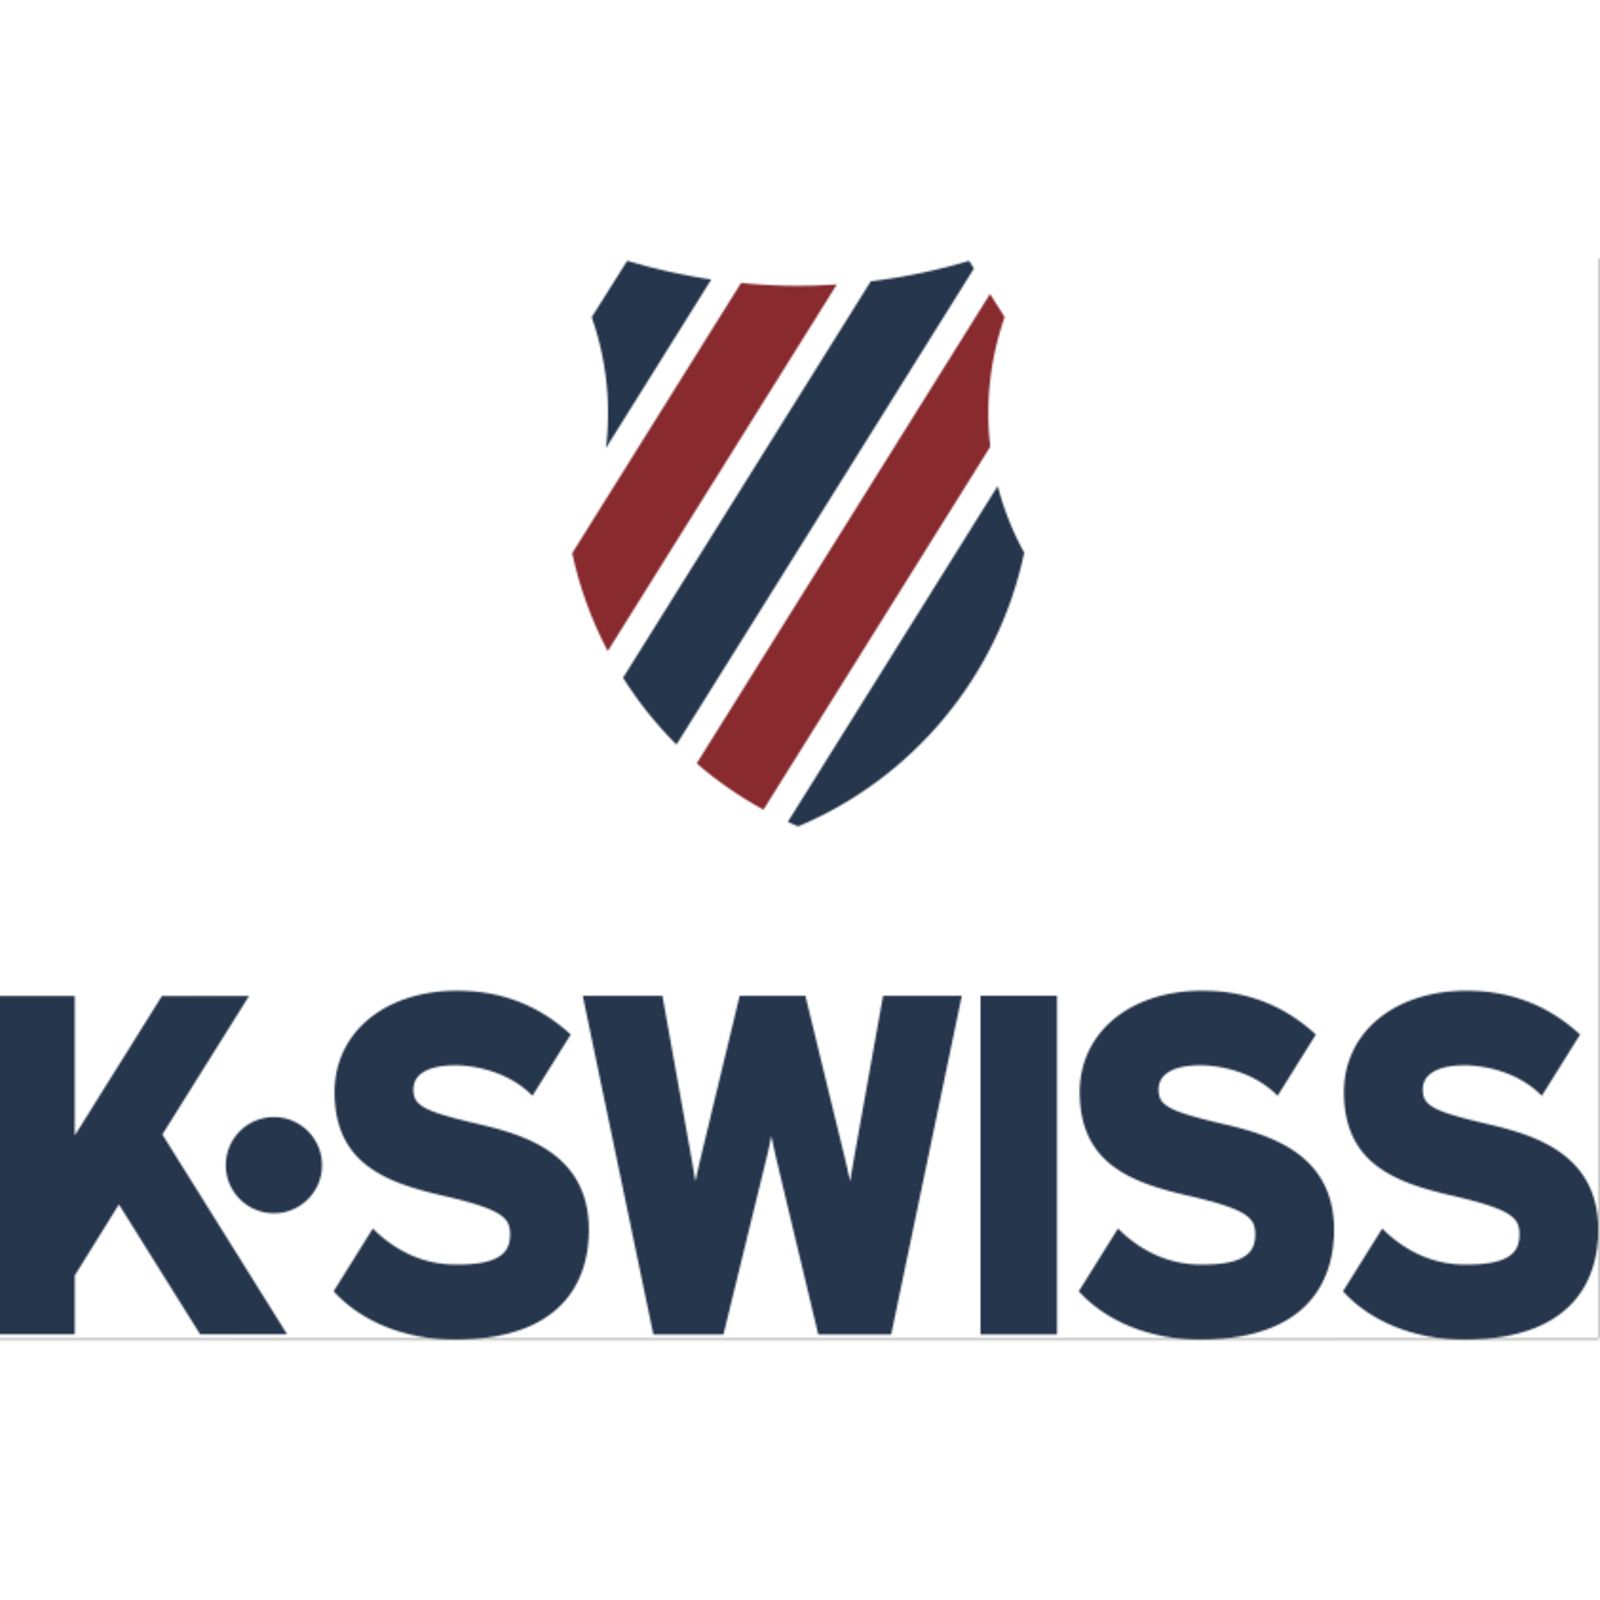 K-SWISS (Image 1)